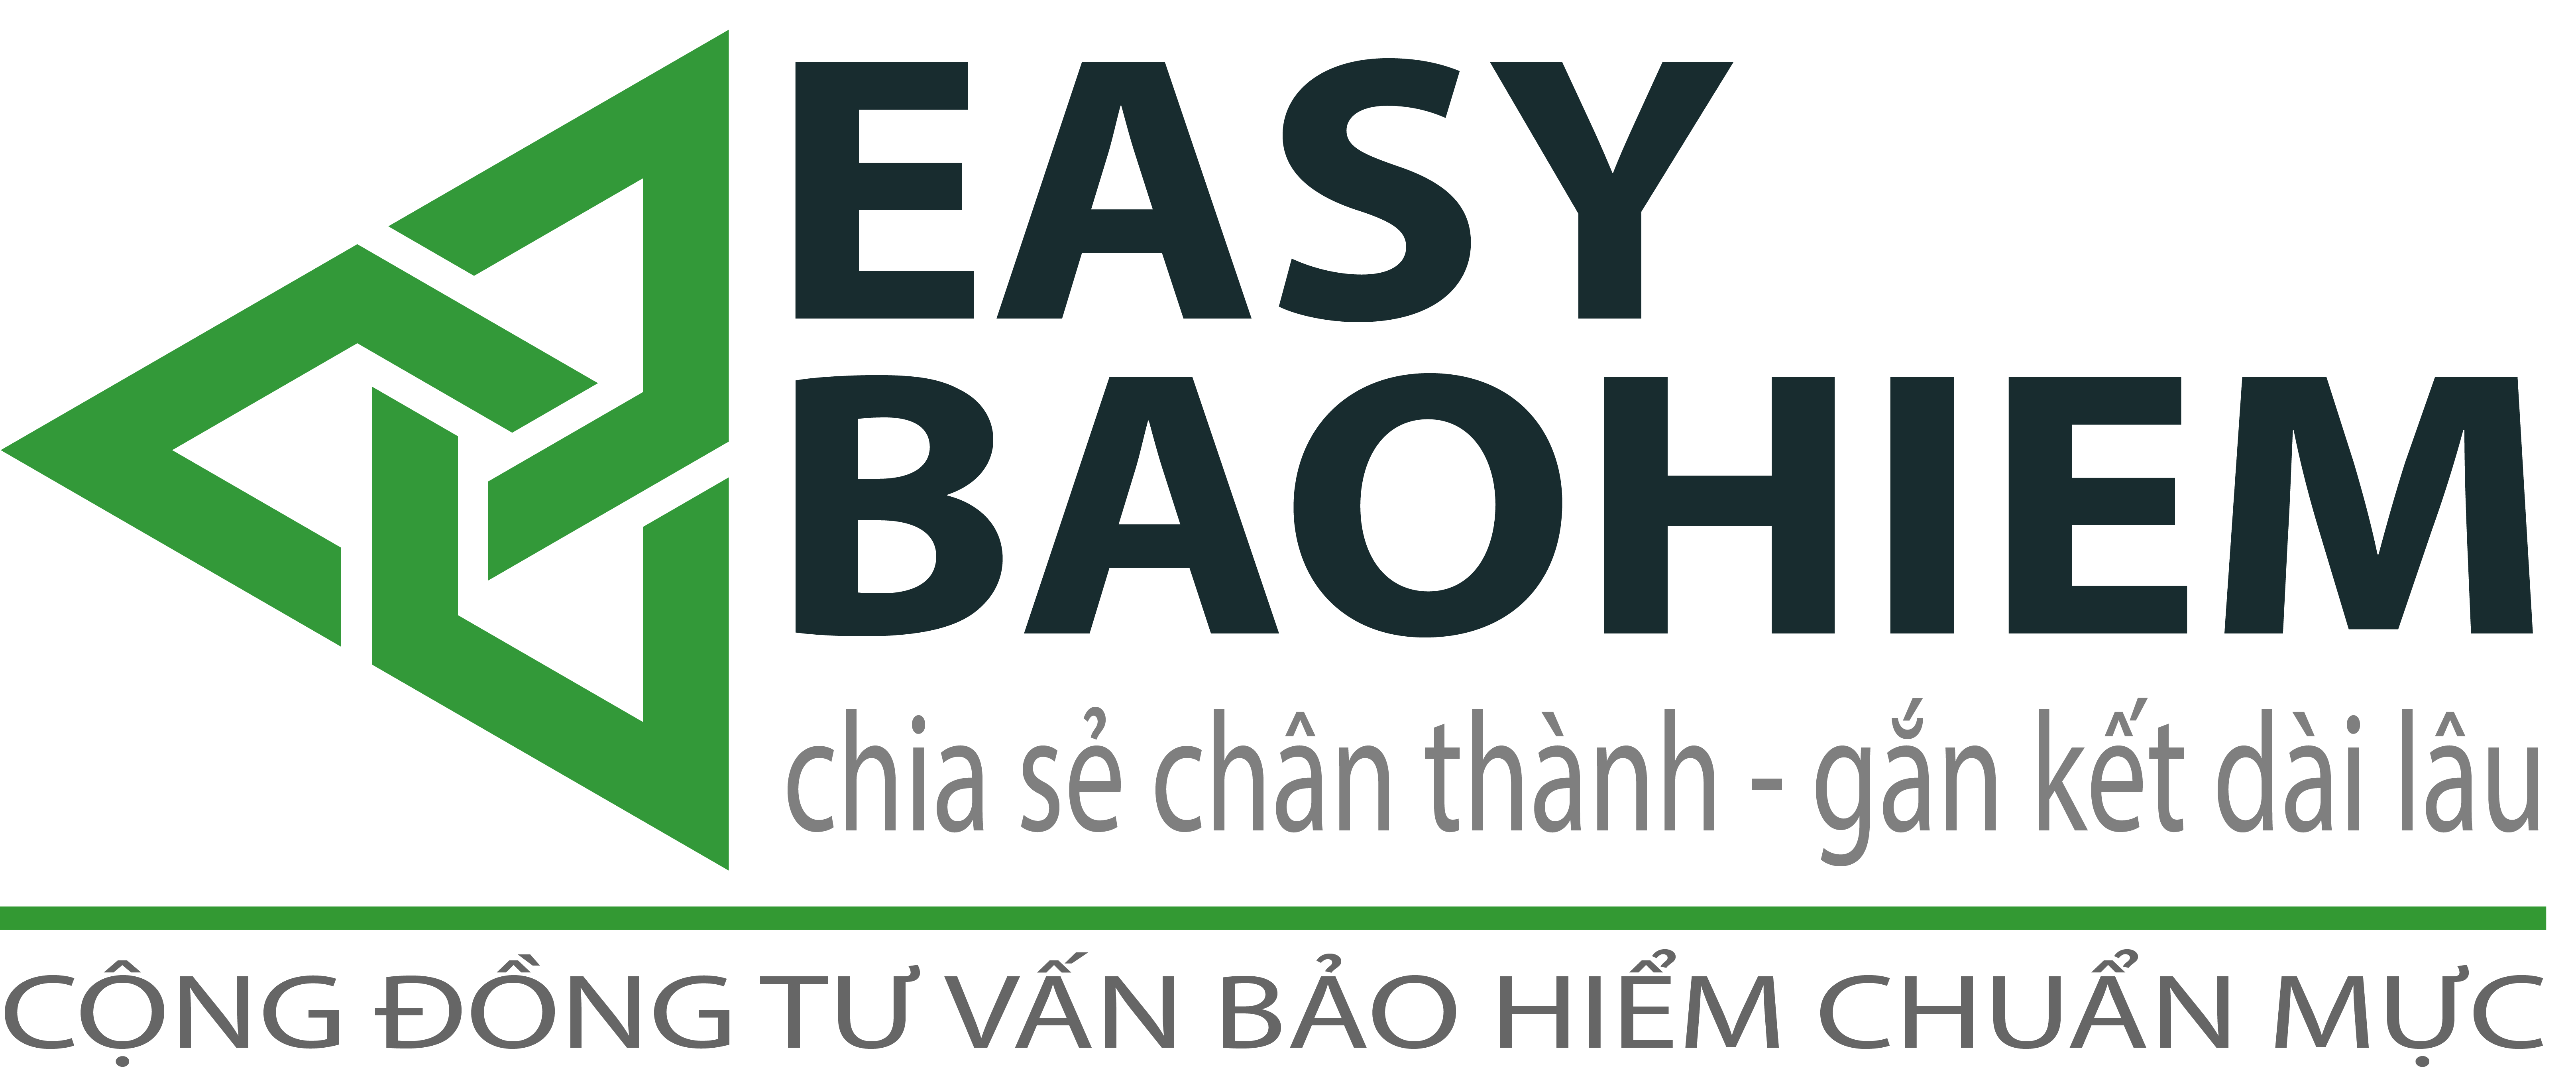 EASY BẢO HIỂM